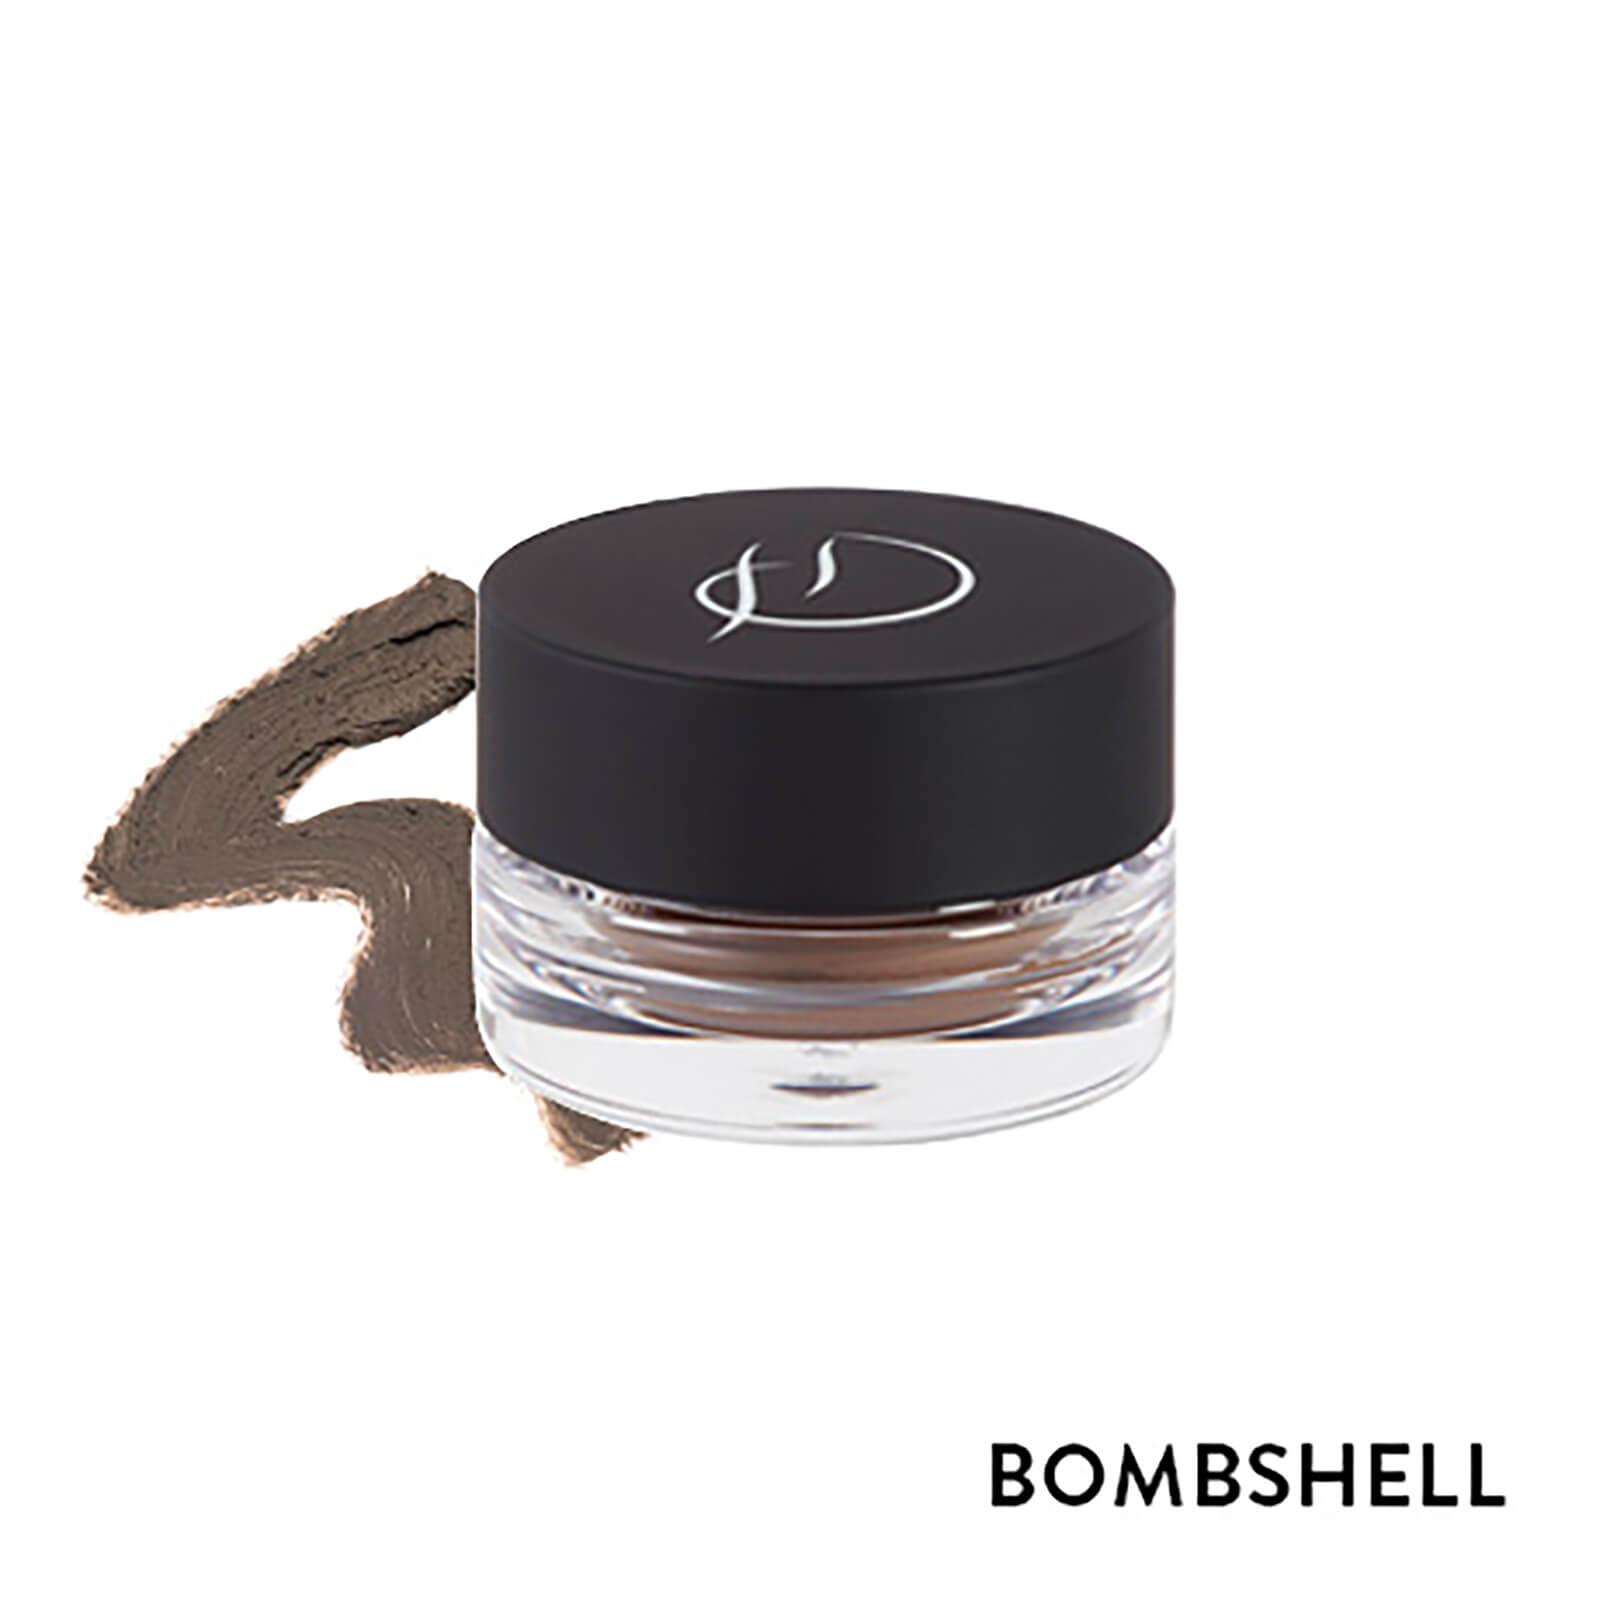 HD Brows Brow Crème (Various Shades) - Bombshell